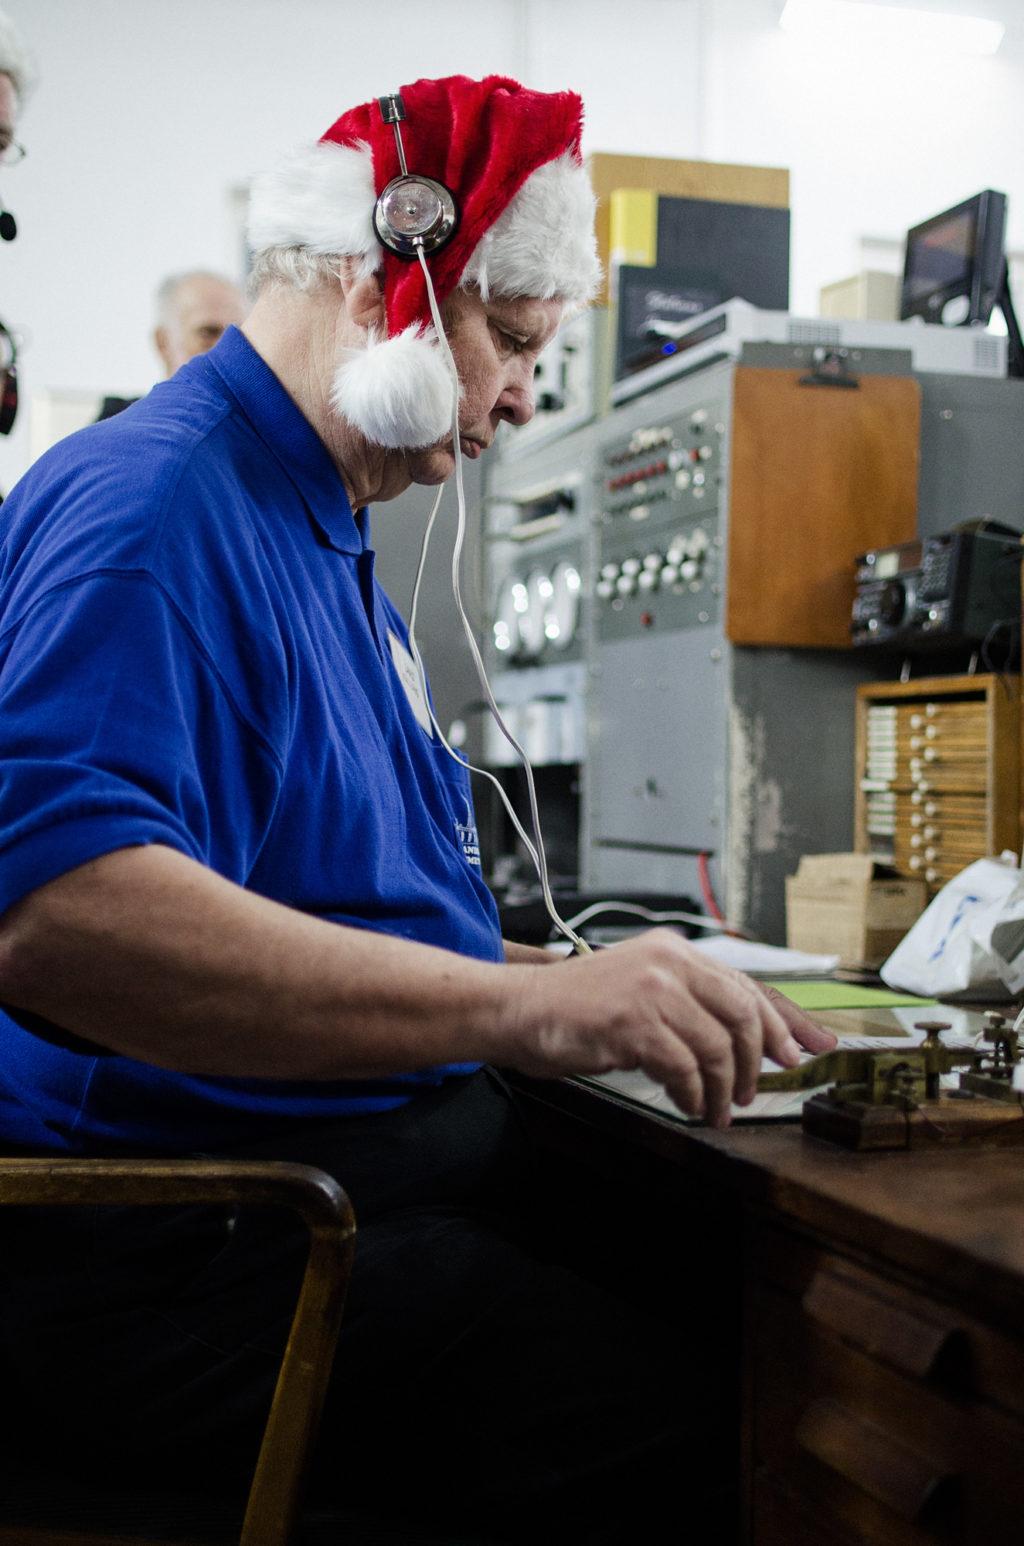 SAQ Alexanderson Alternator Christmas Eve Transmission Cancelled